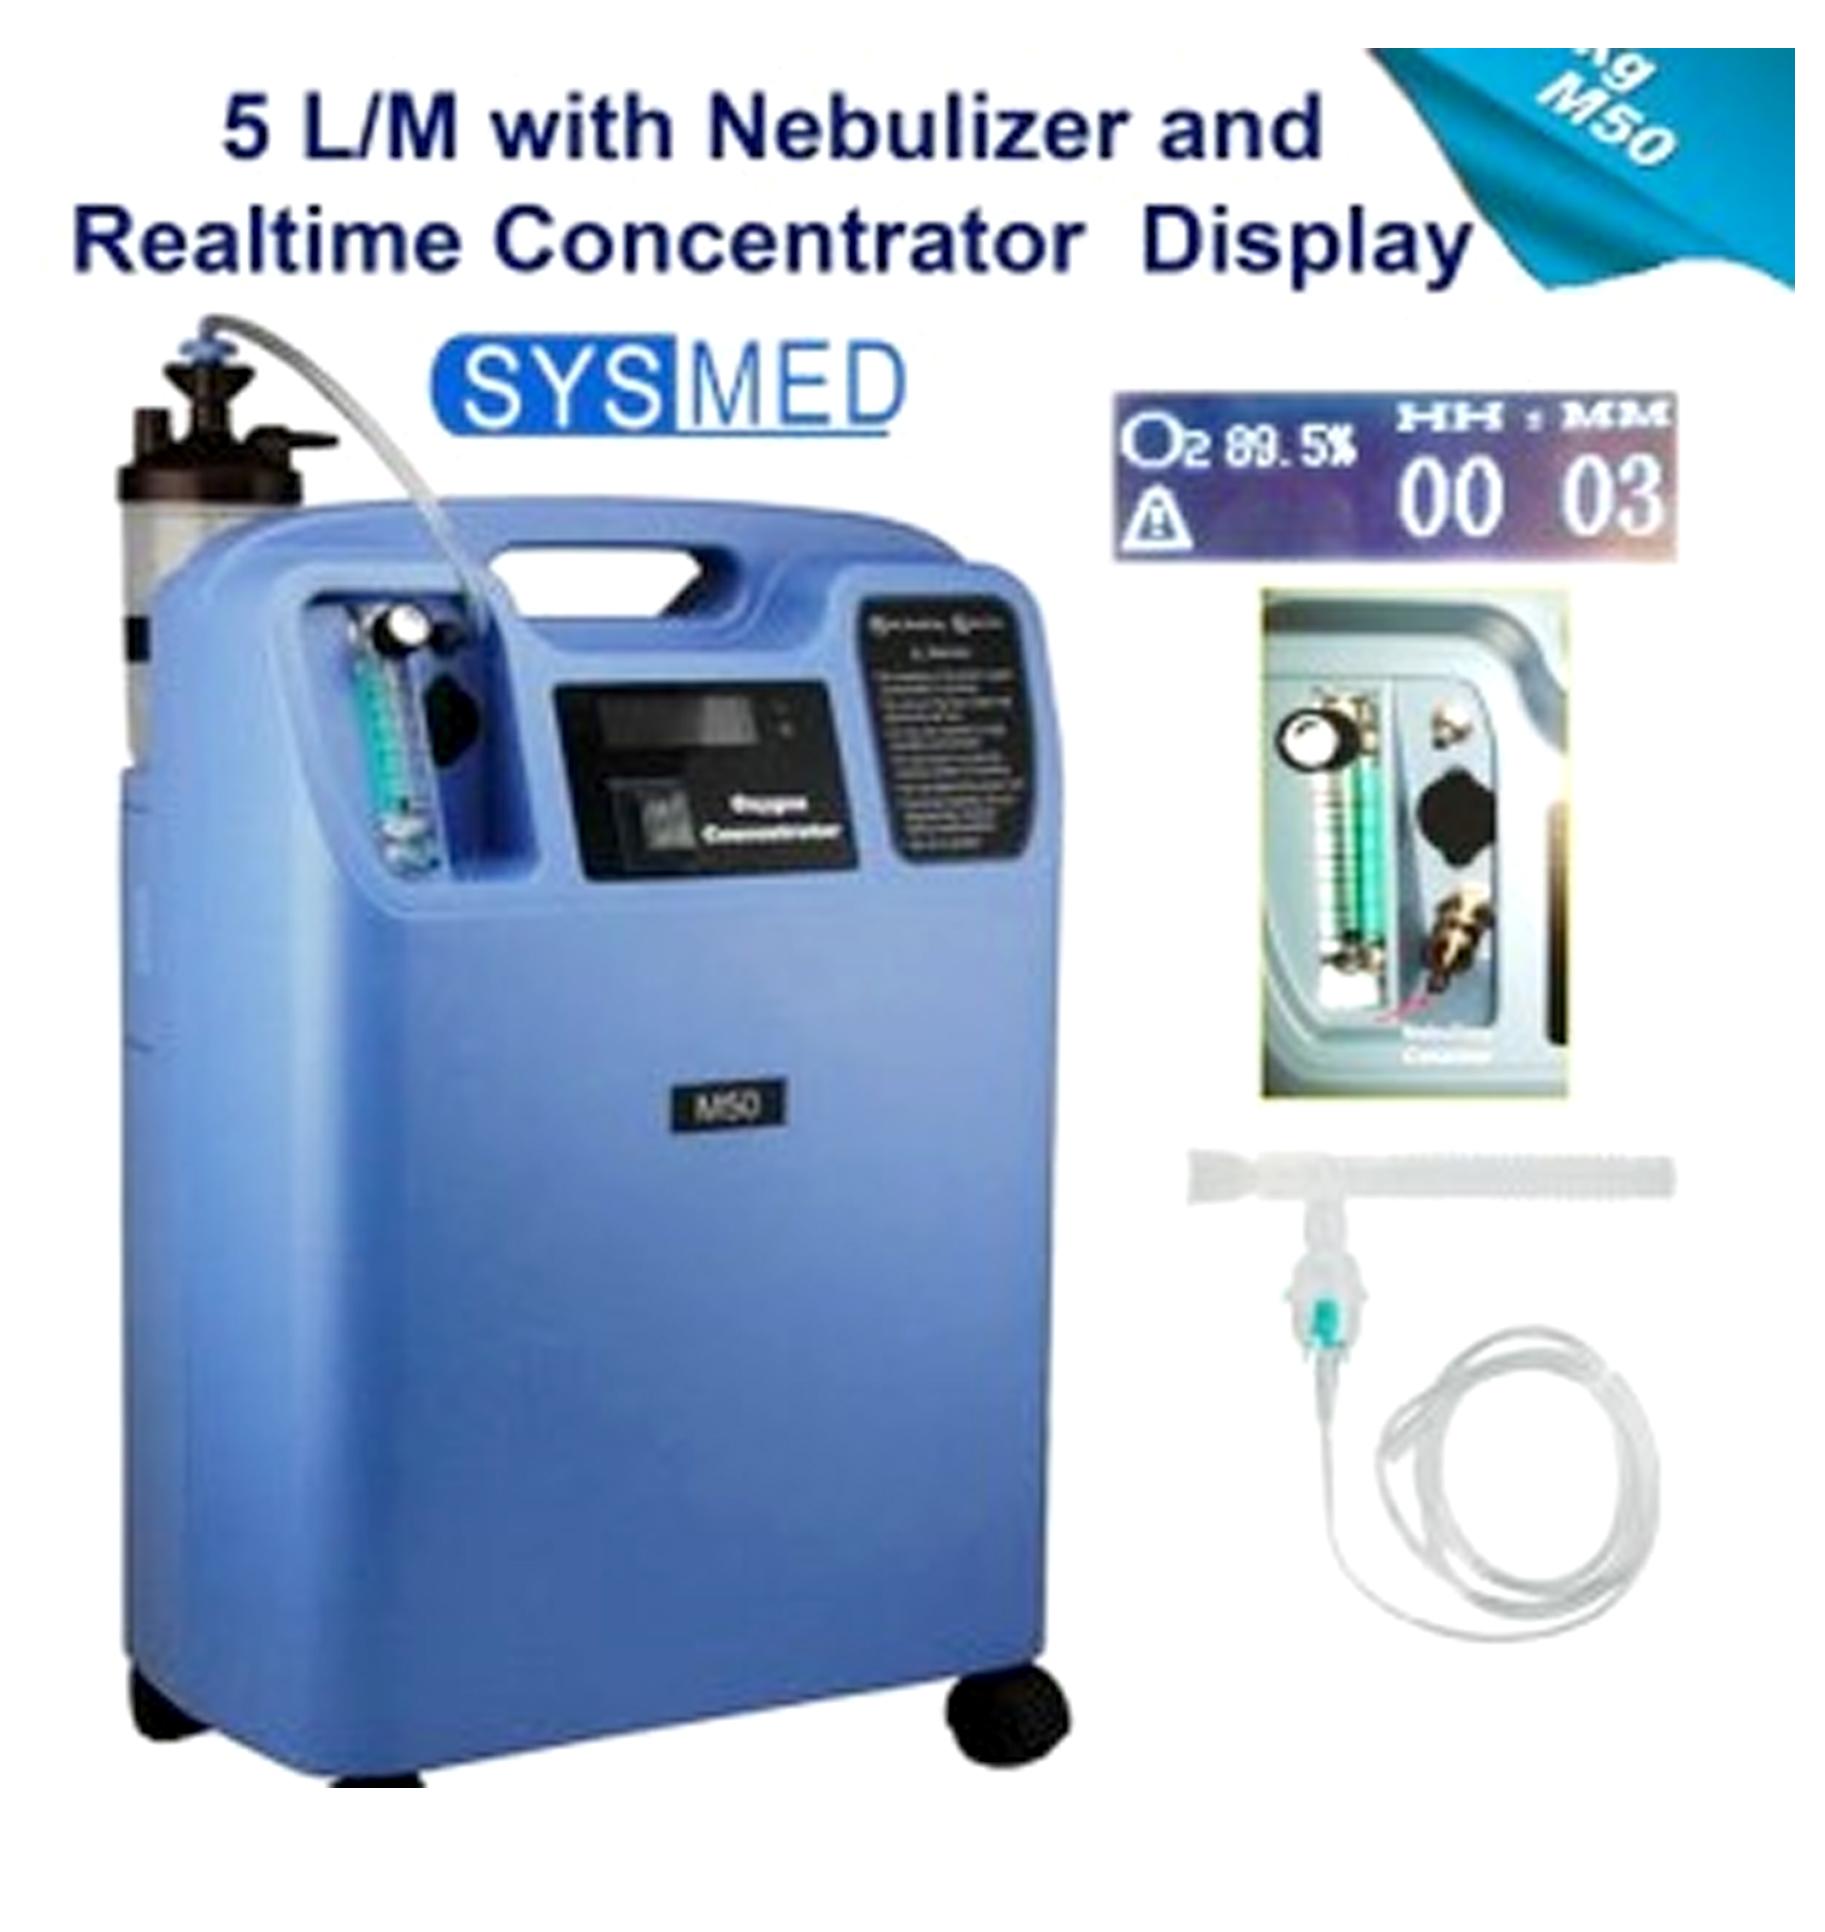 Oxygen Concentrator 5L/M with Nebulizer – Sysmed M50 – PT  Mandiri